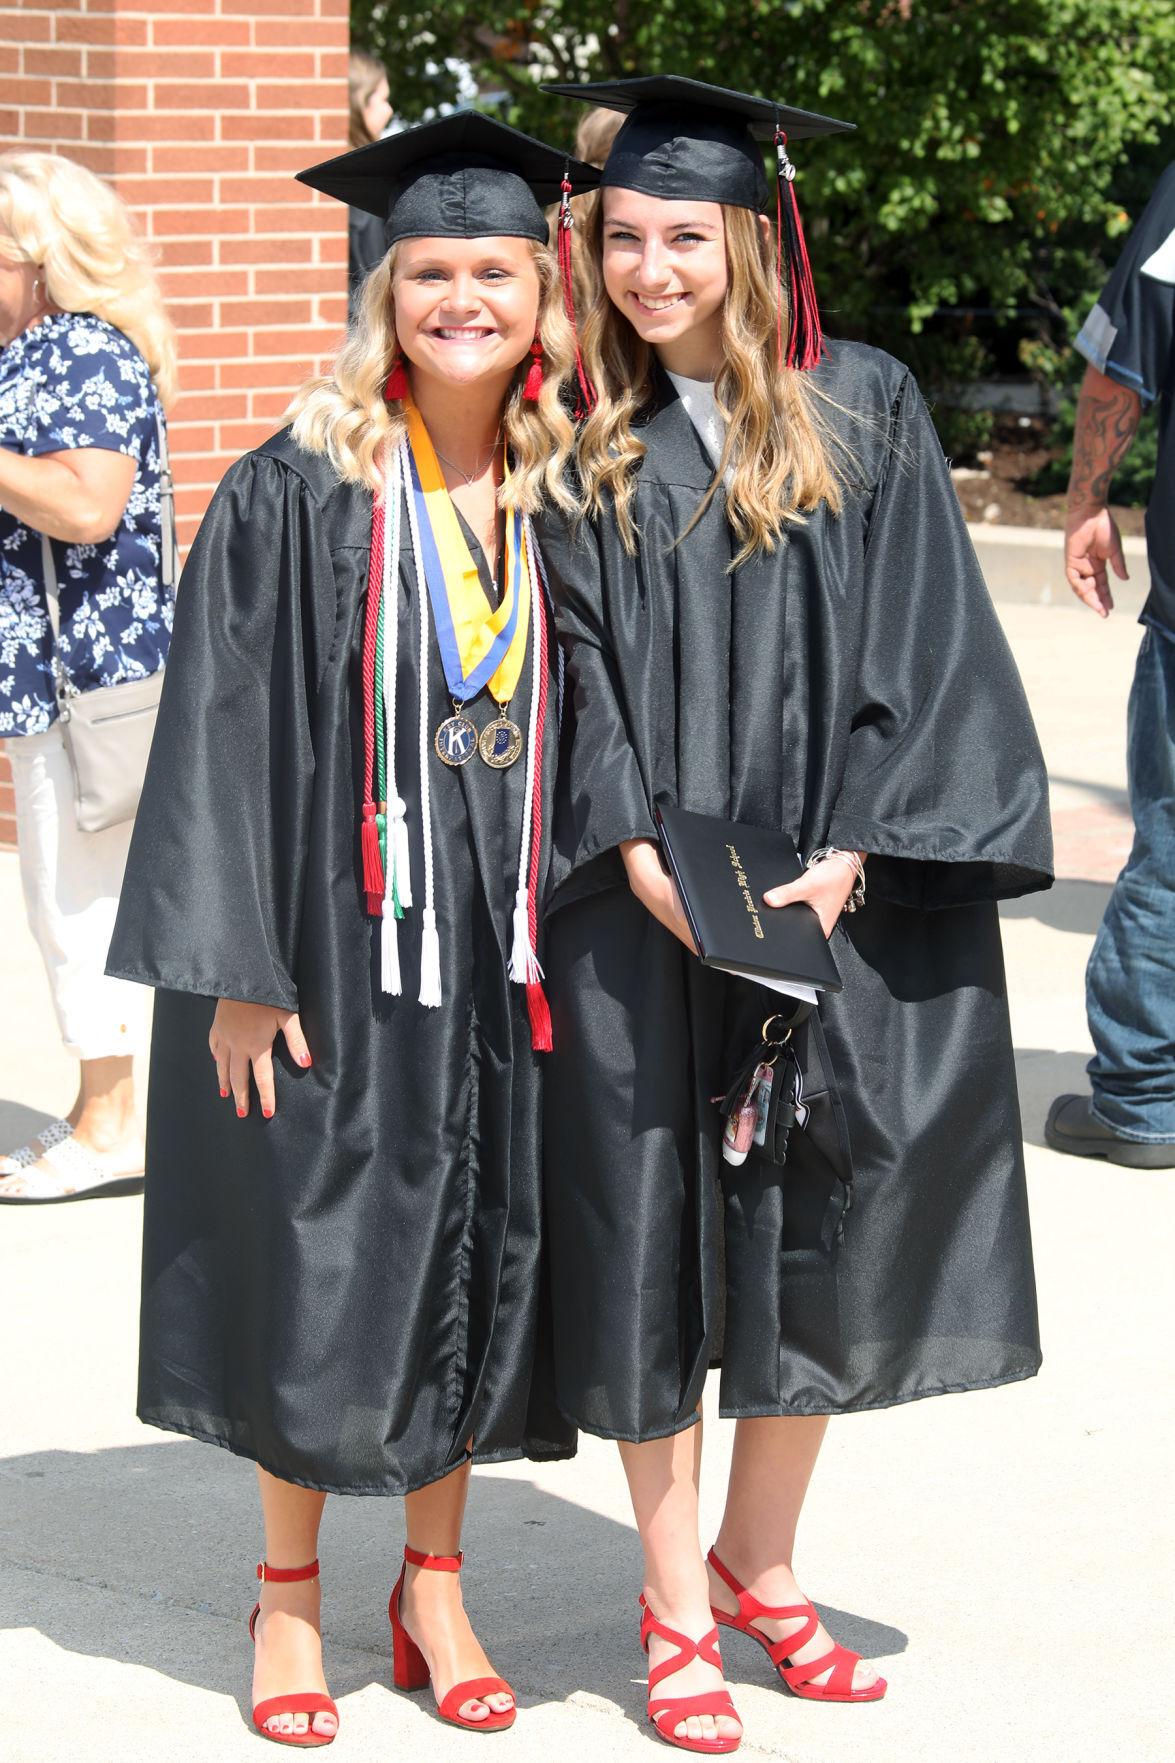 CP Graduation PHOTO 2